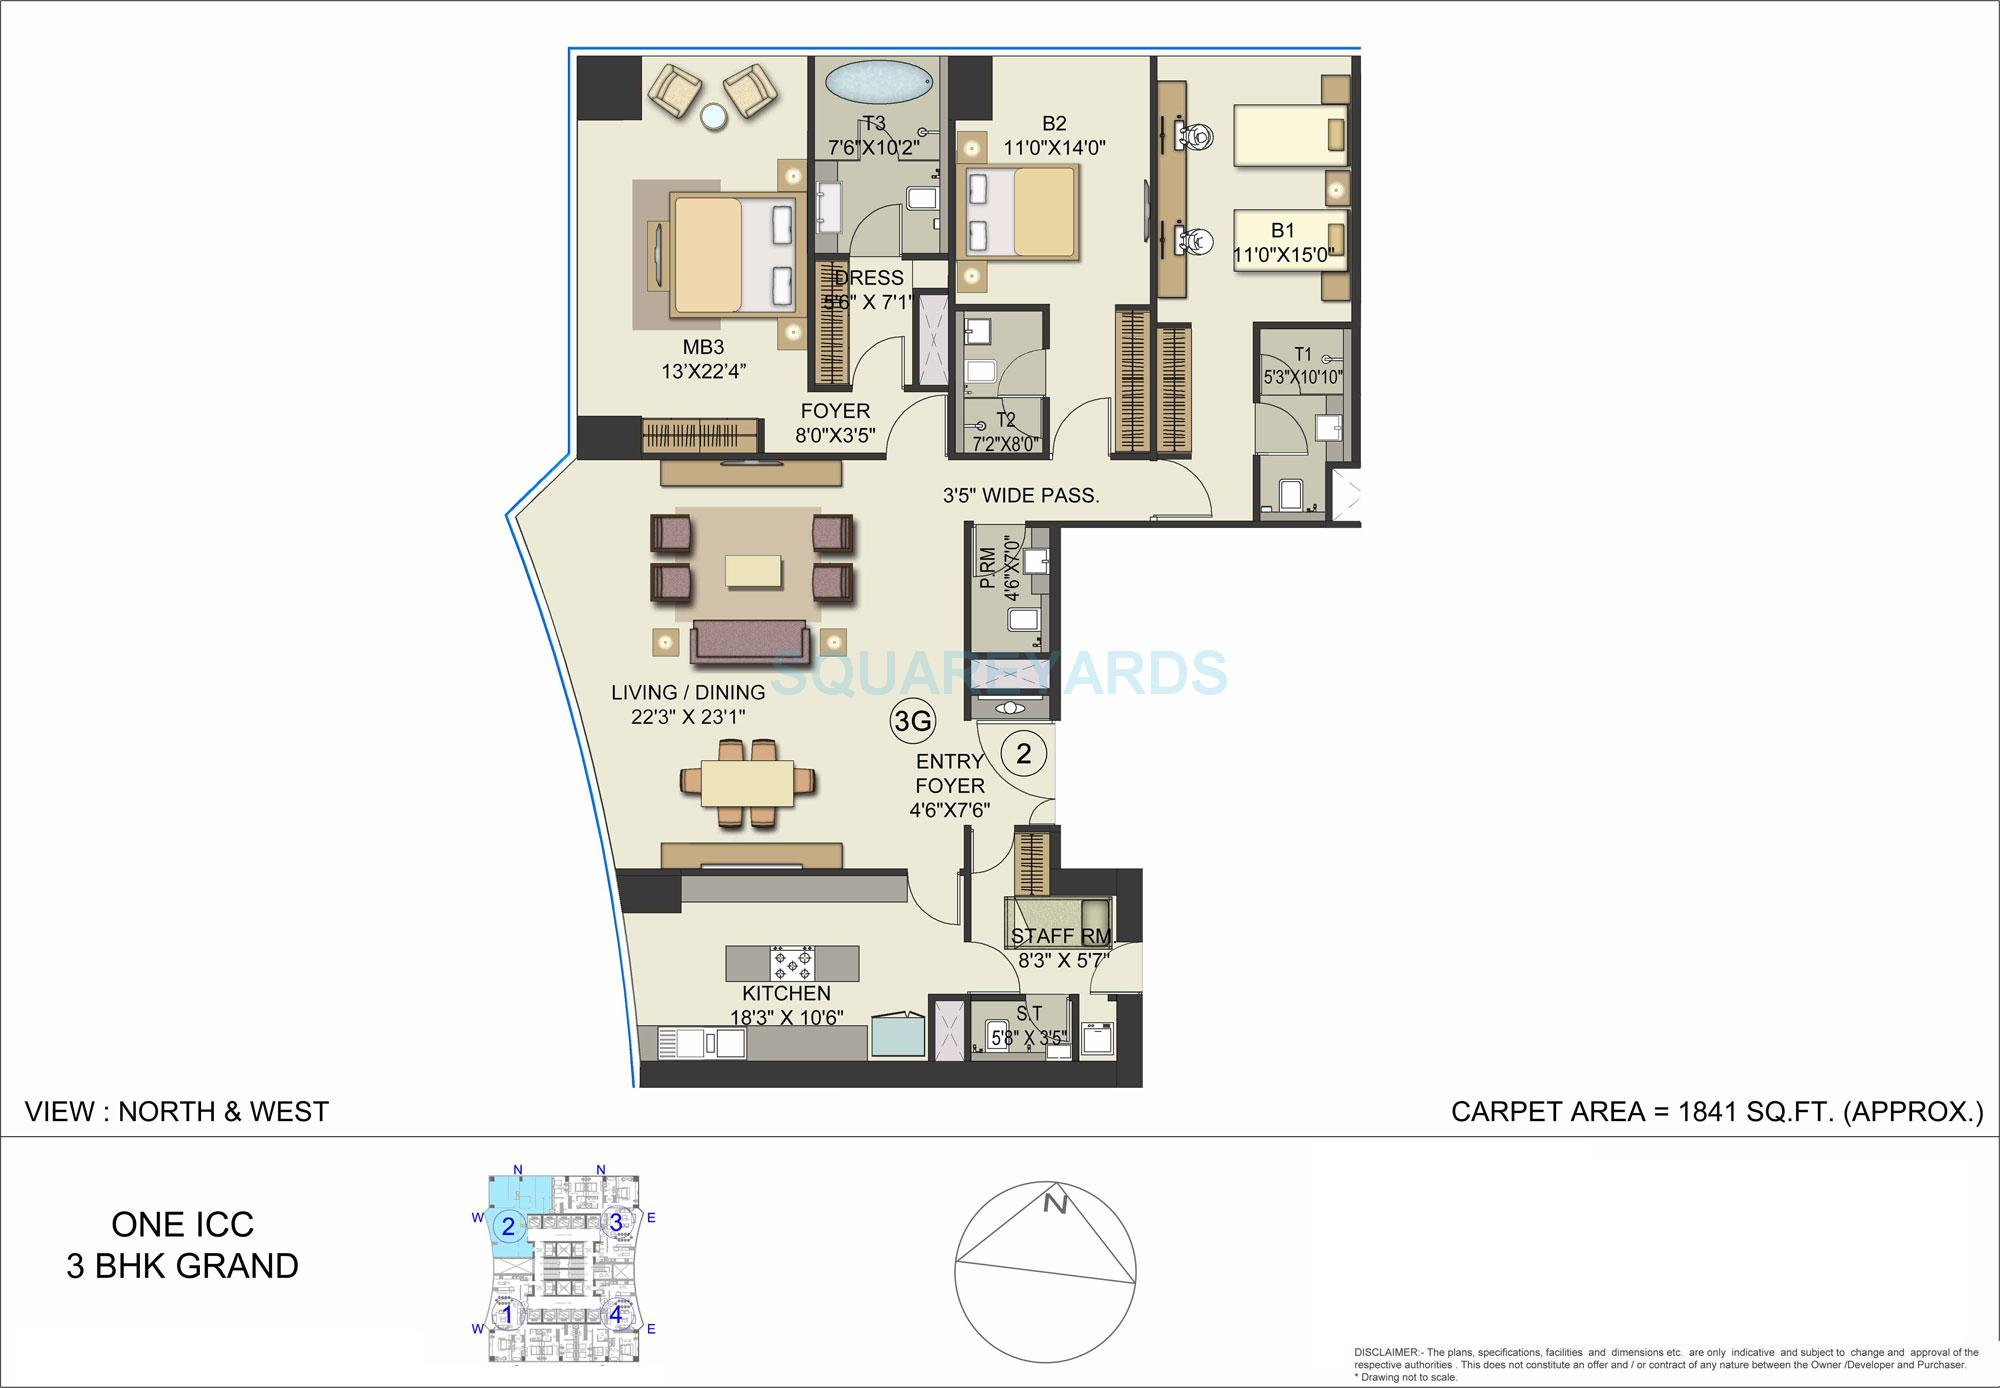 bombay realty one icc apartment 3bhk 1841sqft 1